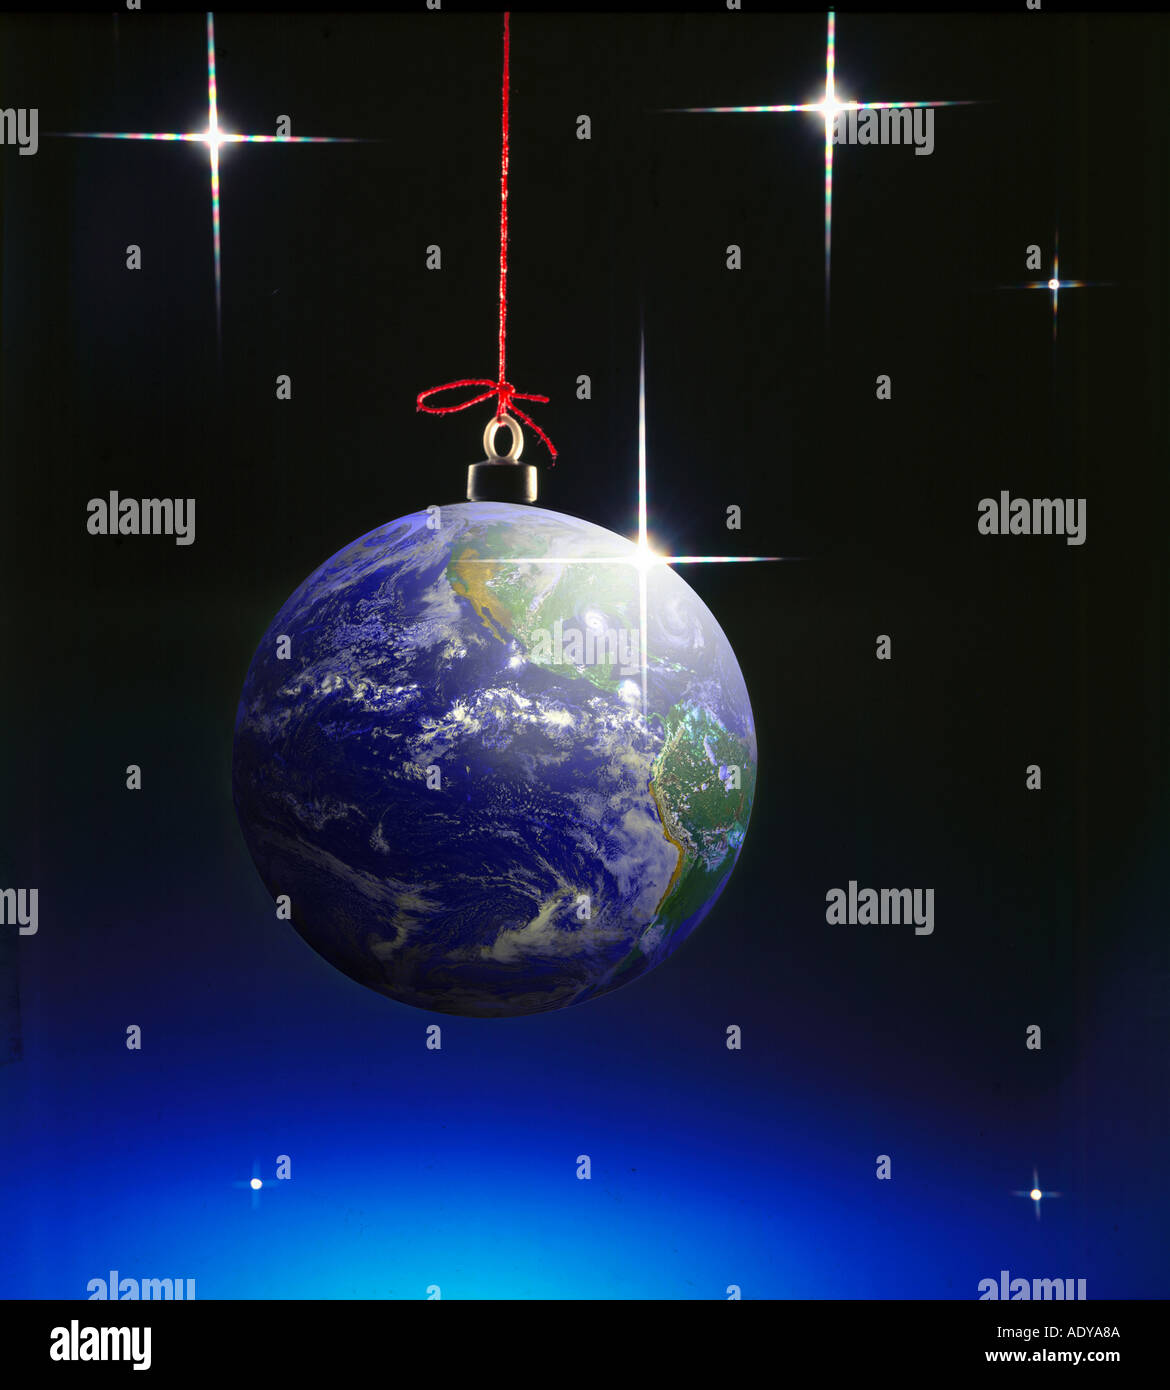 Feiern ich Planeten als Weihnachtskugel x Mas Firmament Stern ...